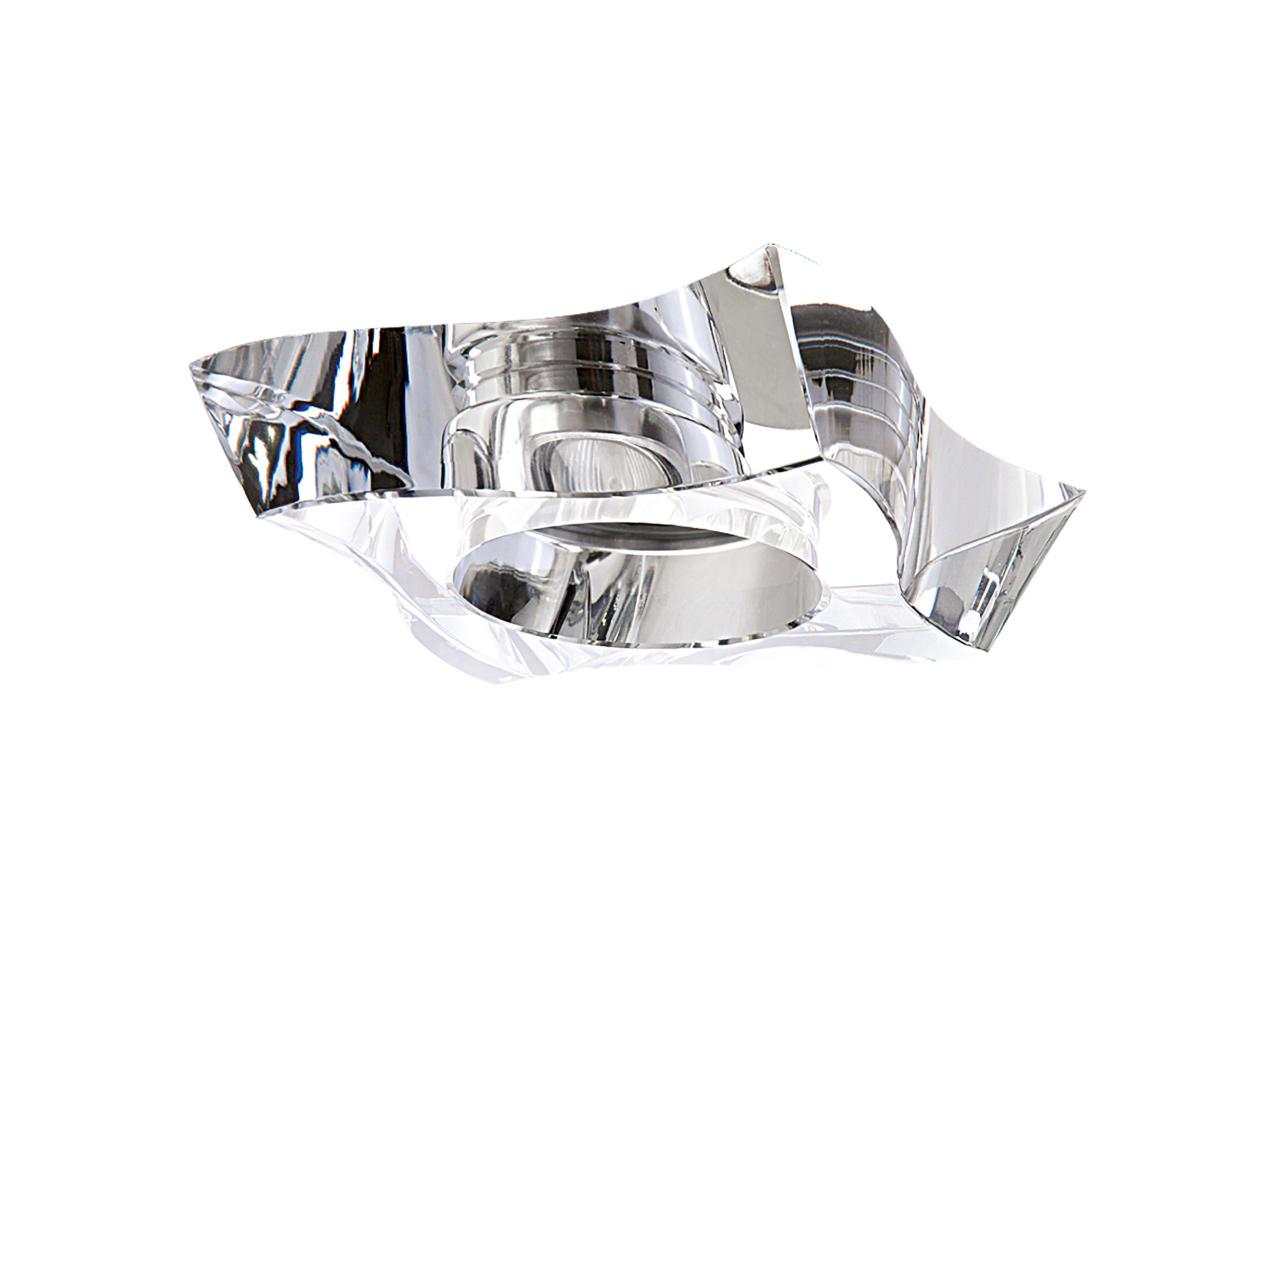 Светильник Flutto MR16 / HP16 хром / прозрачный Lightstar 006430